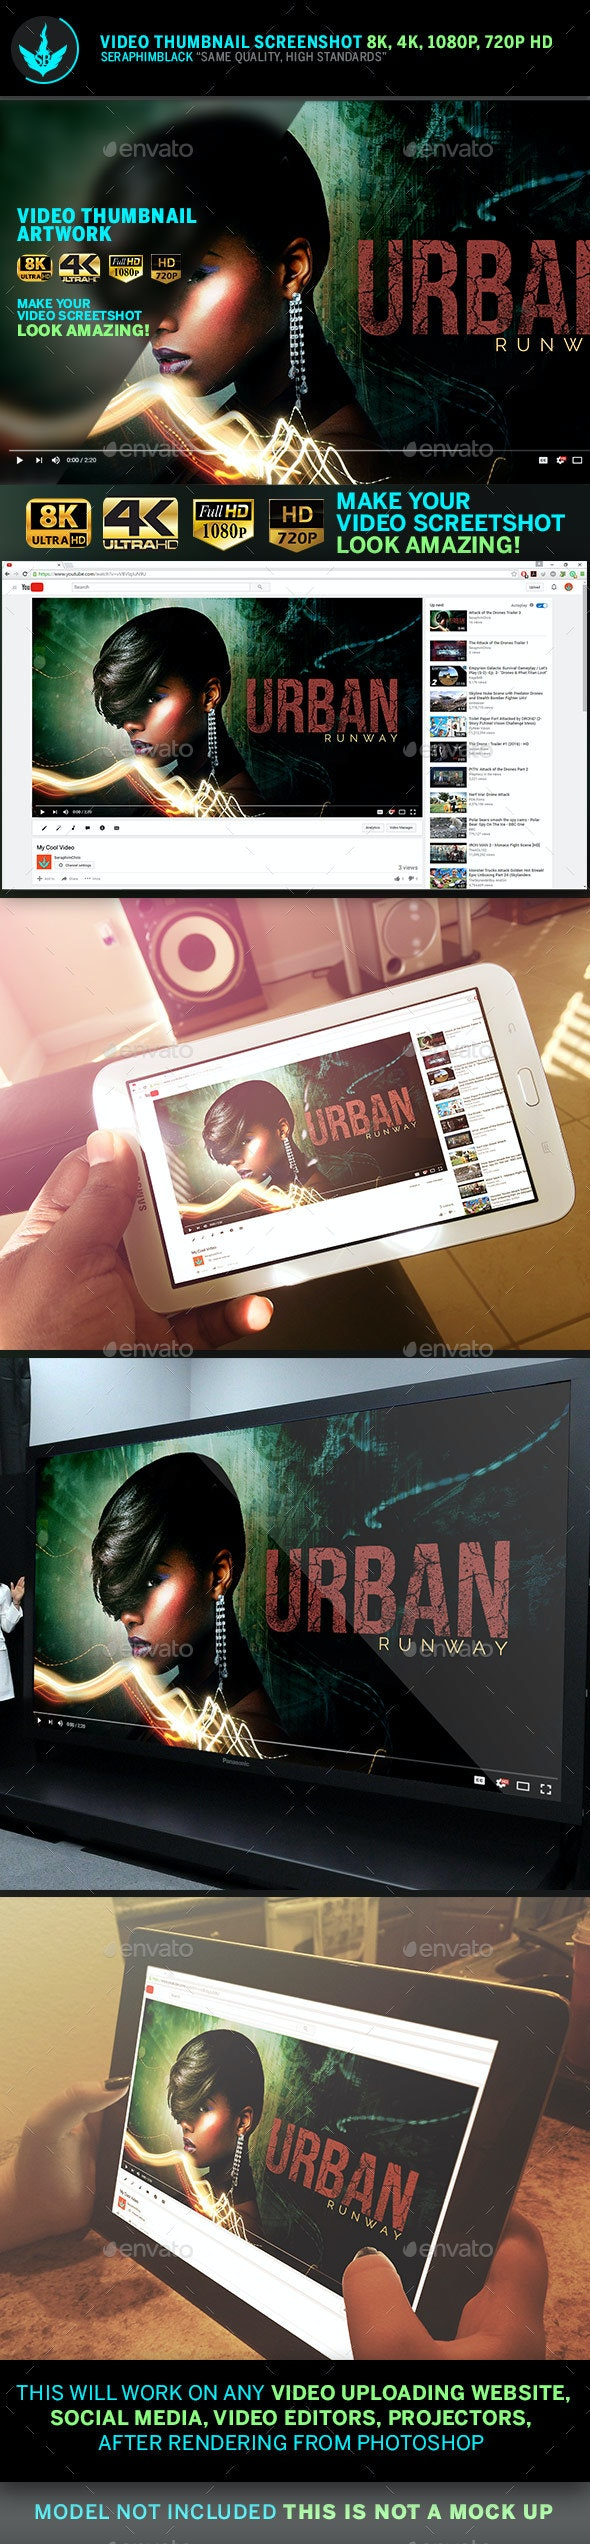 Urban Youtube Video Thumbnail Preview Template - YouTube Social Media